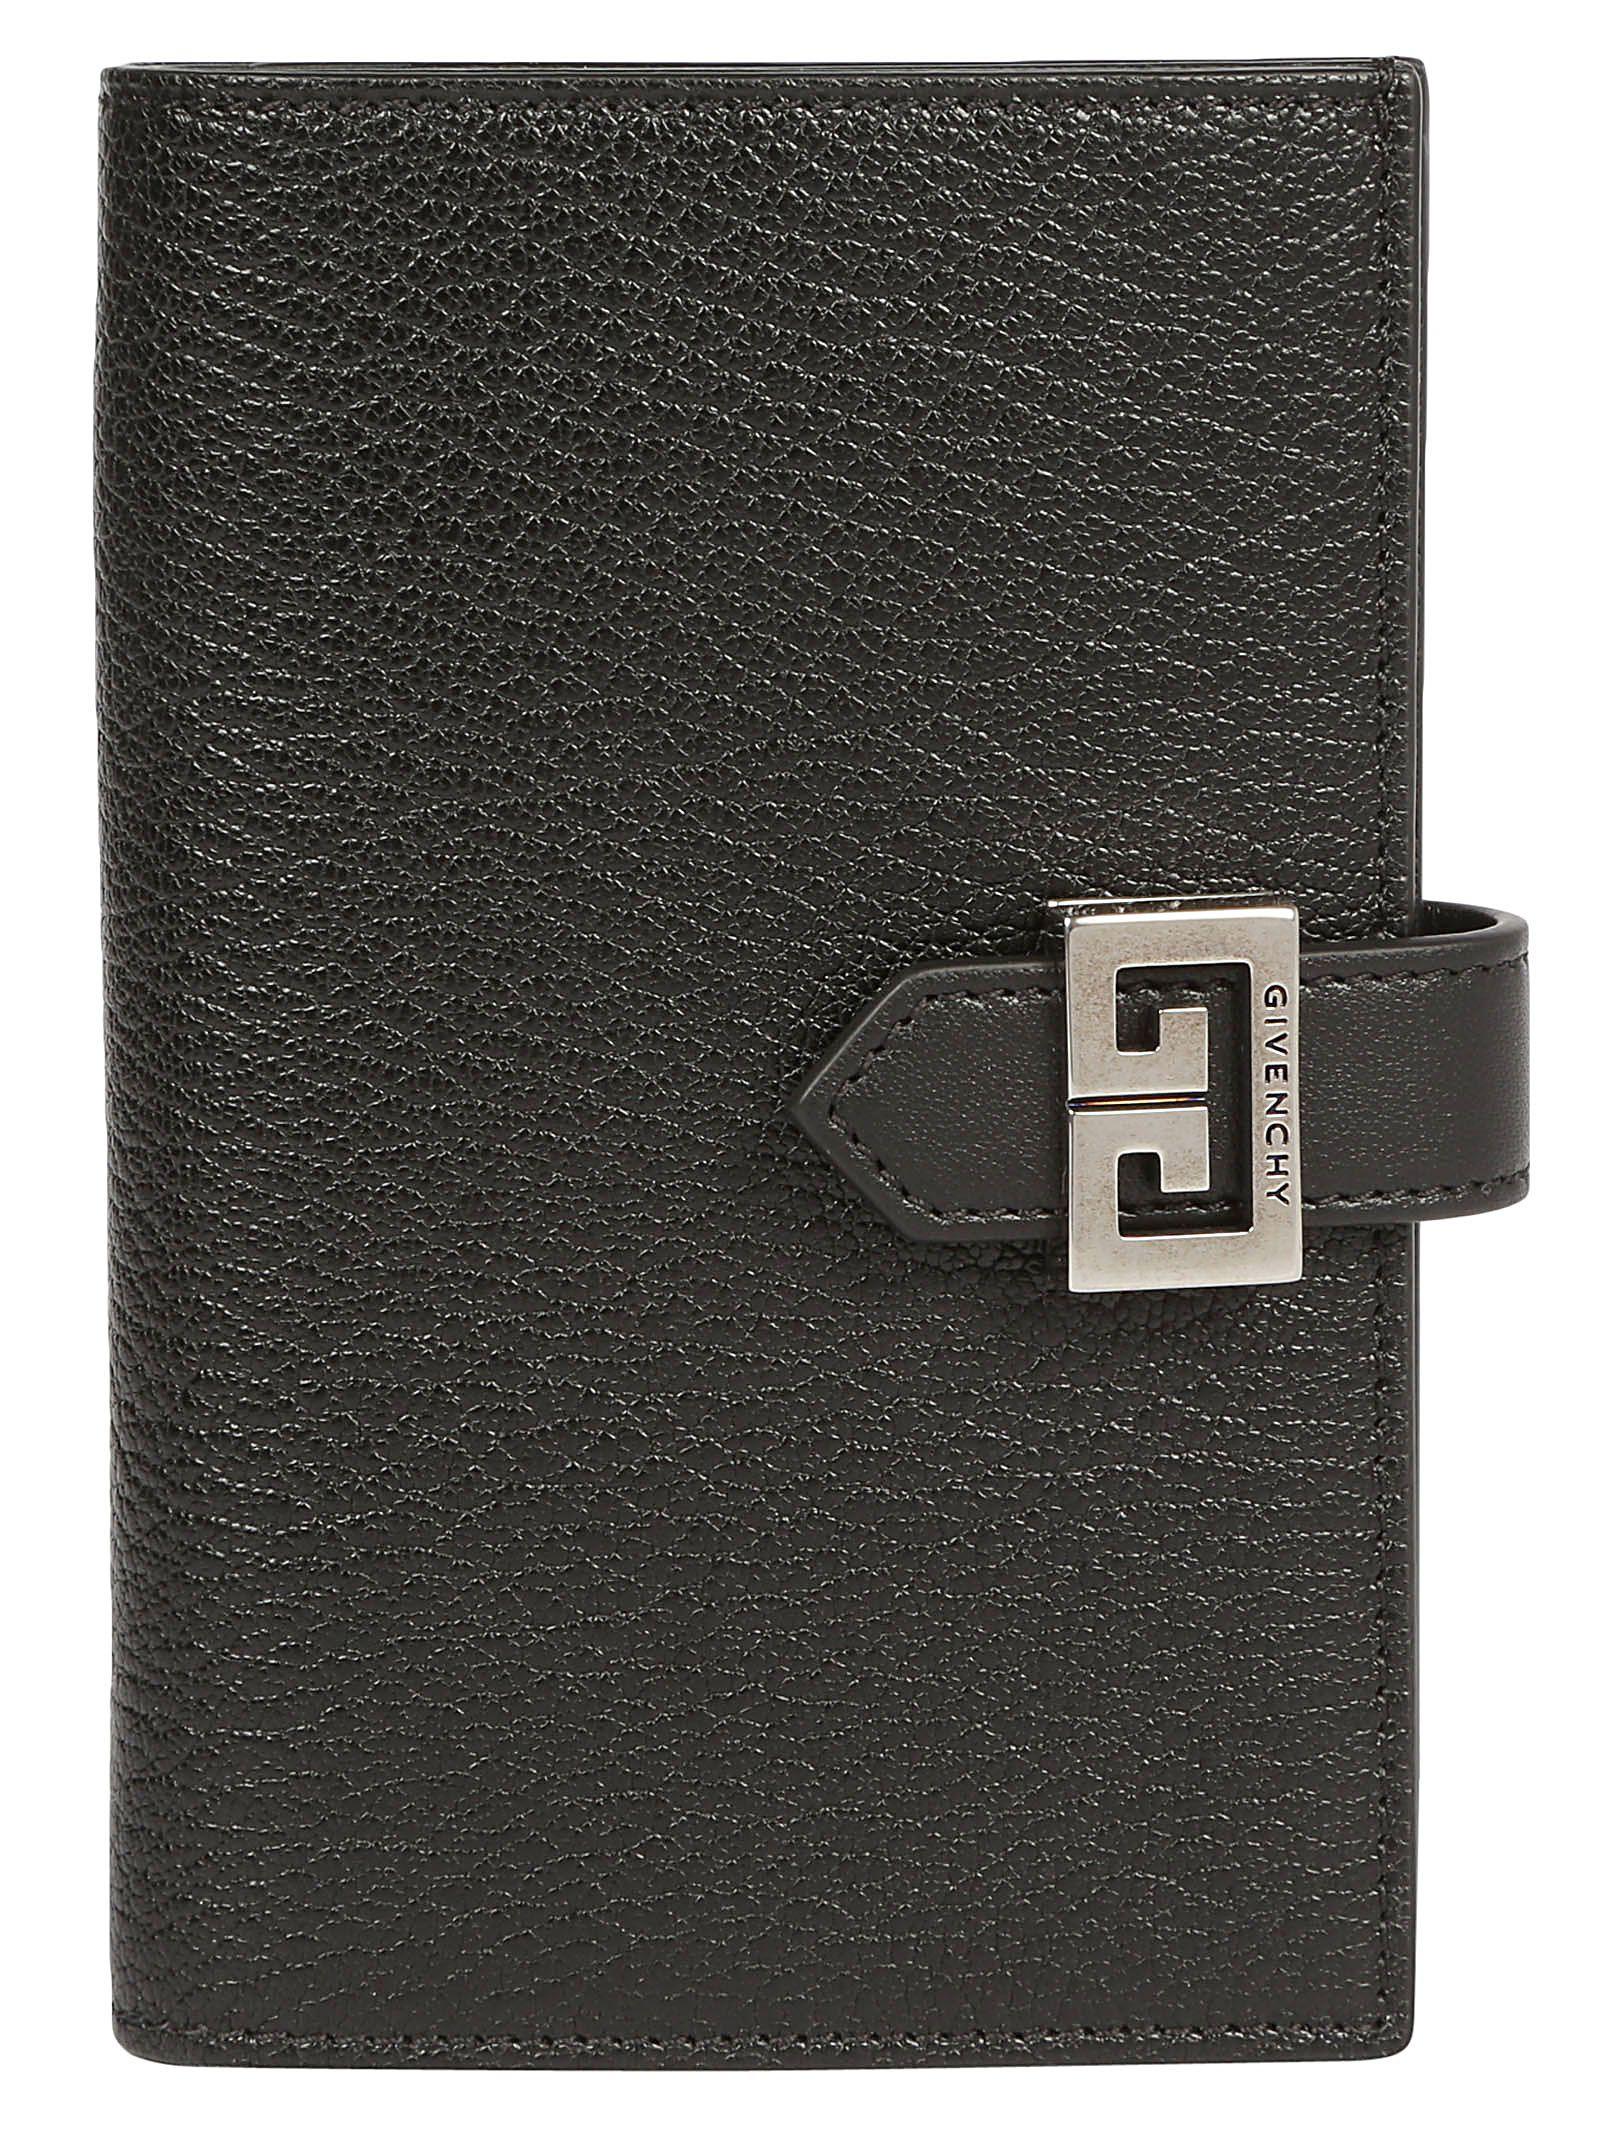 Givenchy Wallet